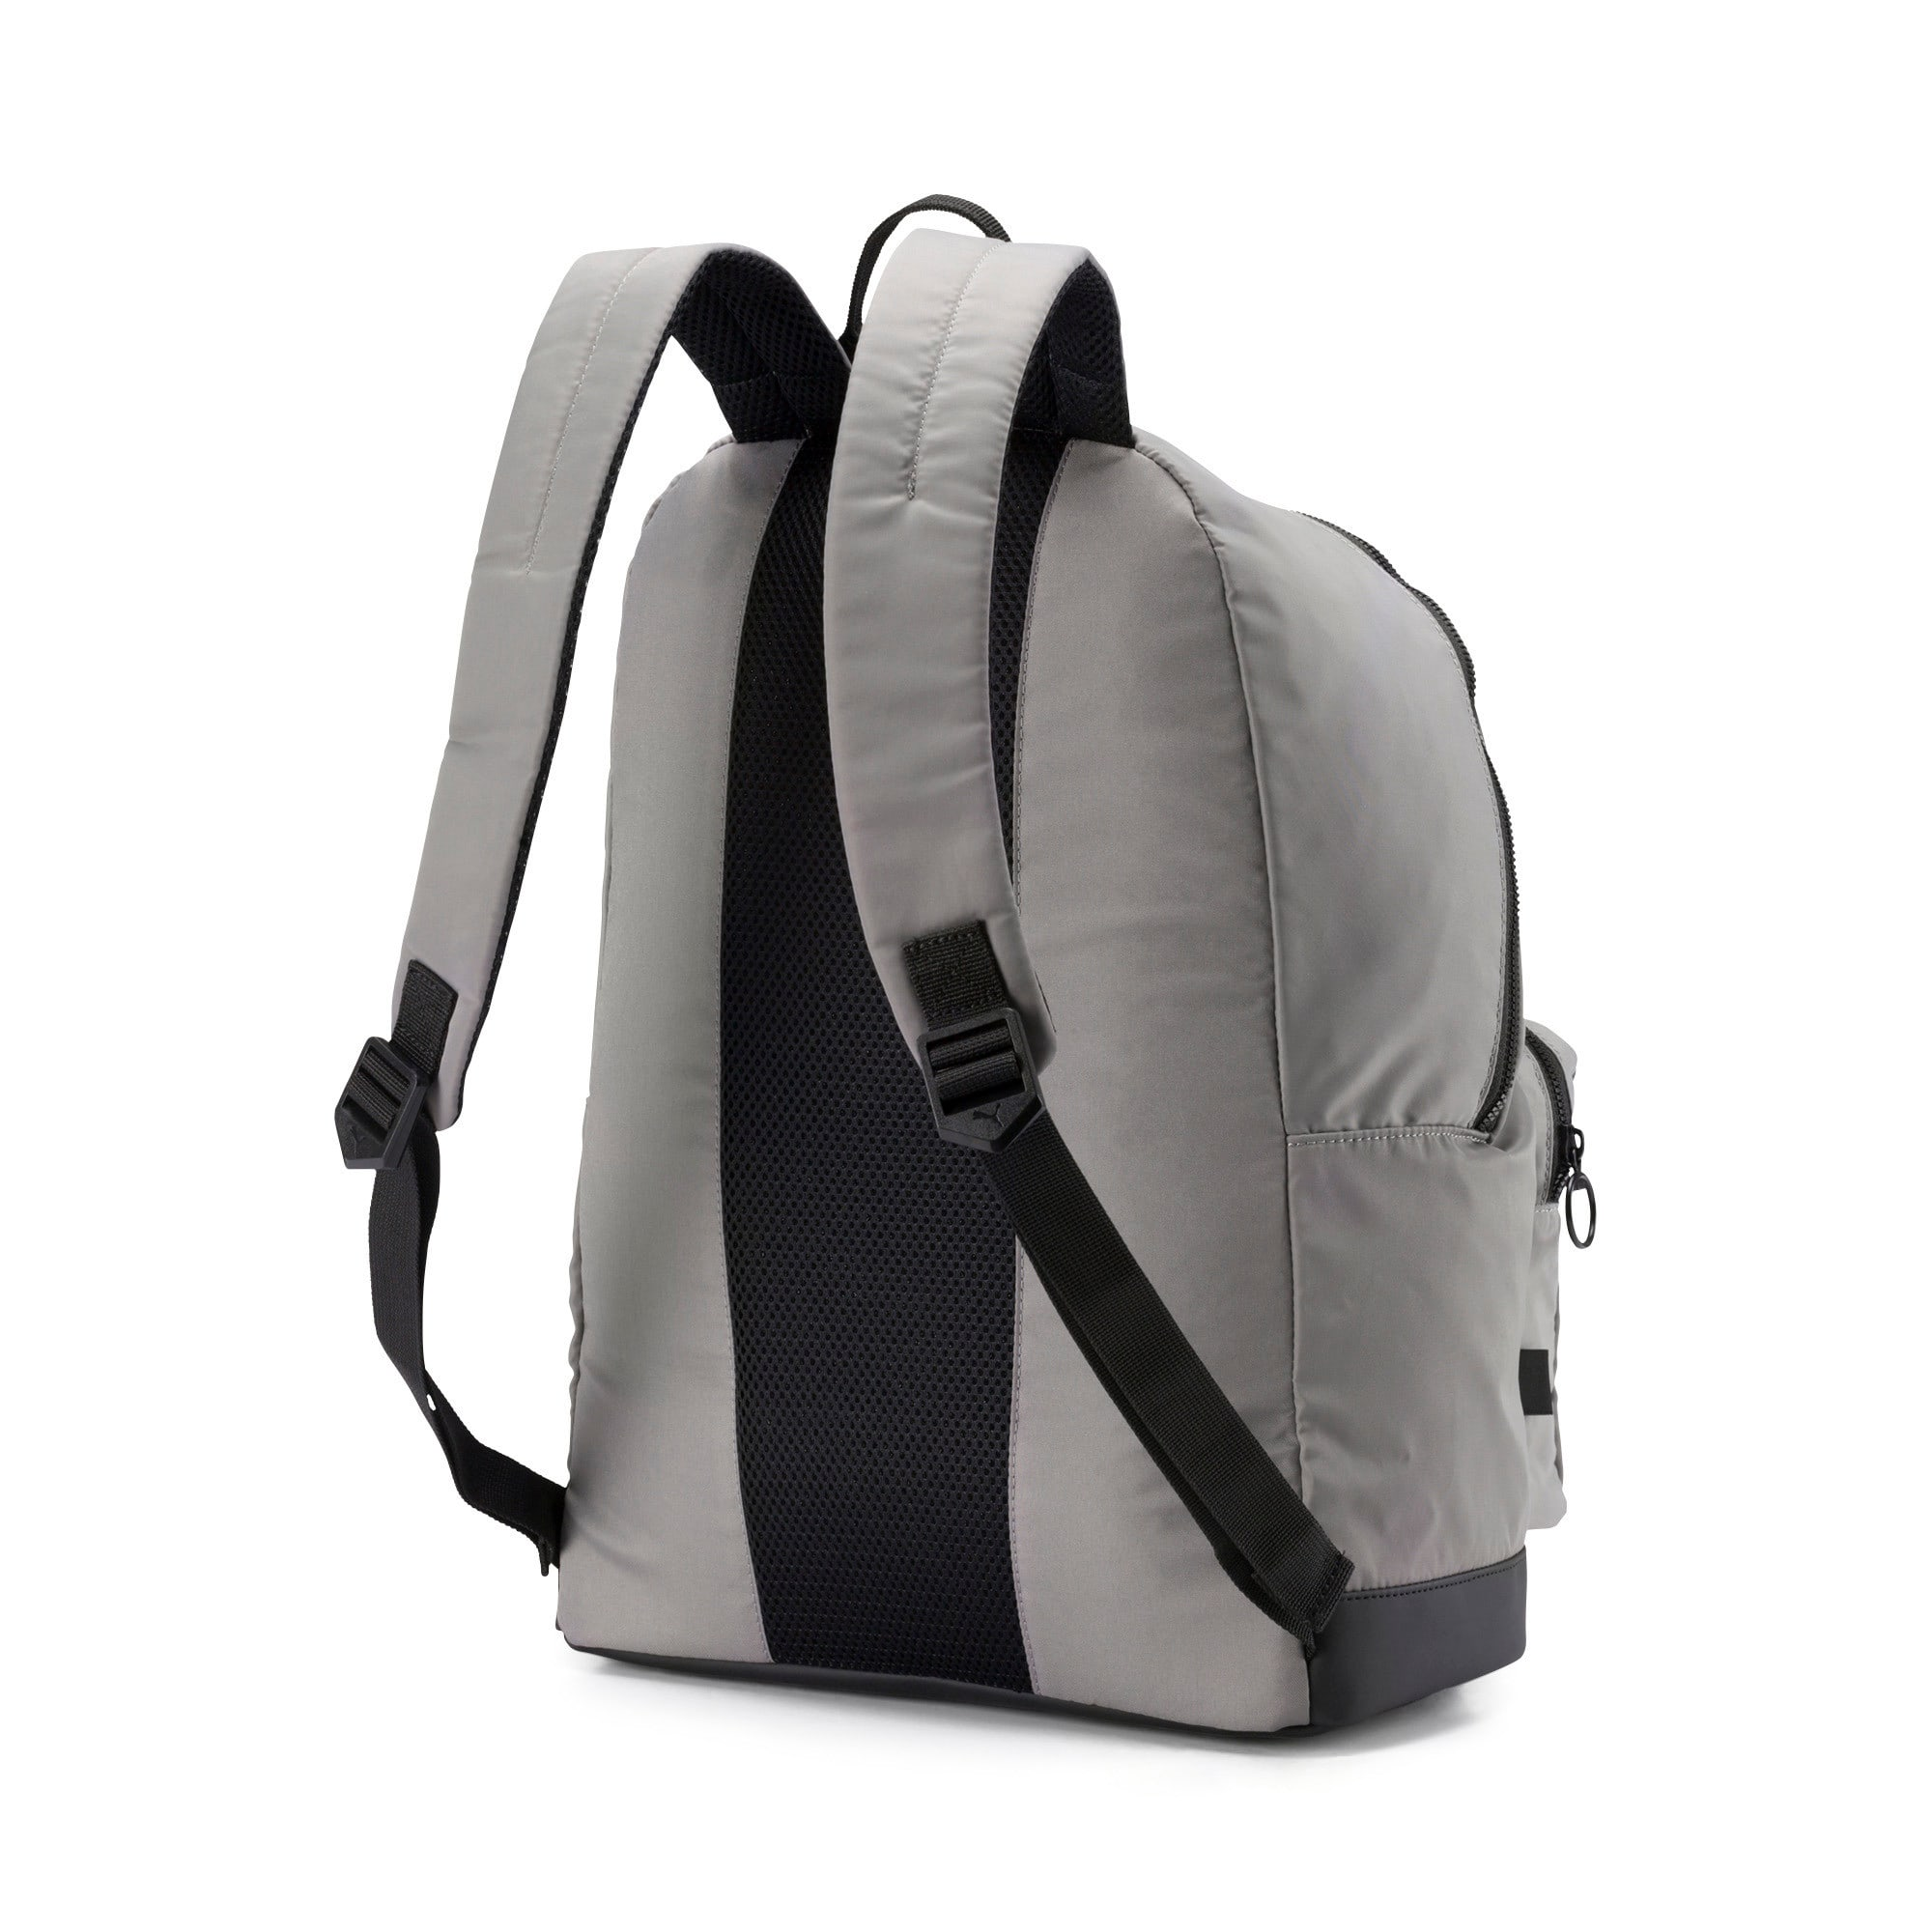 Thumbnail 2 of Originals Backpack Trend, Steel Gray-Puma Black, medium